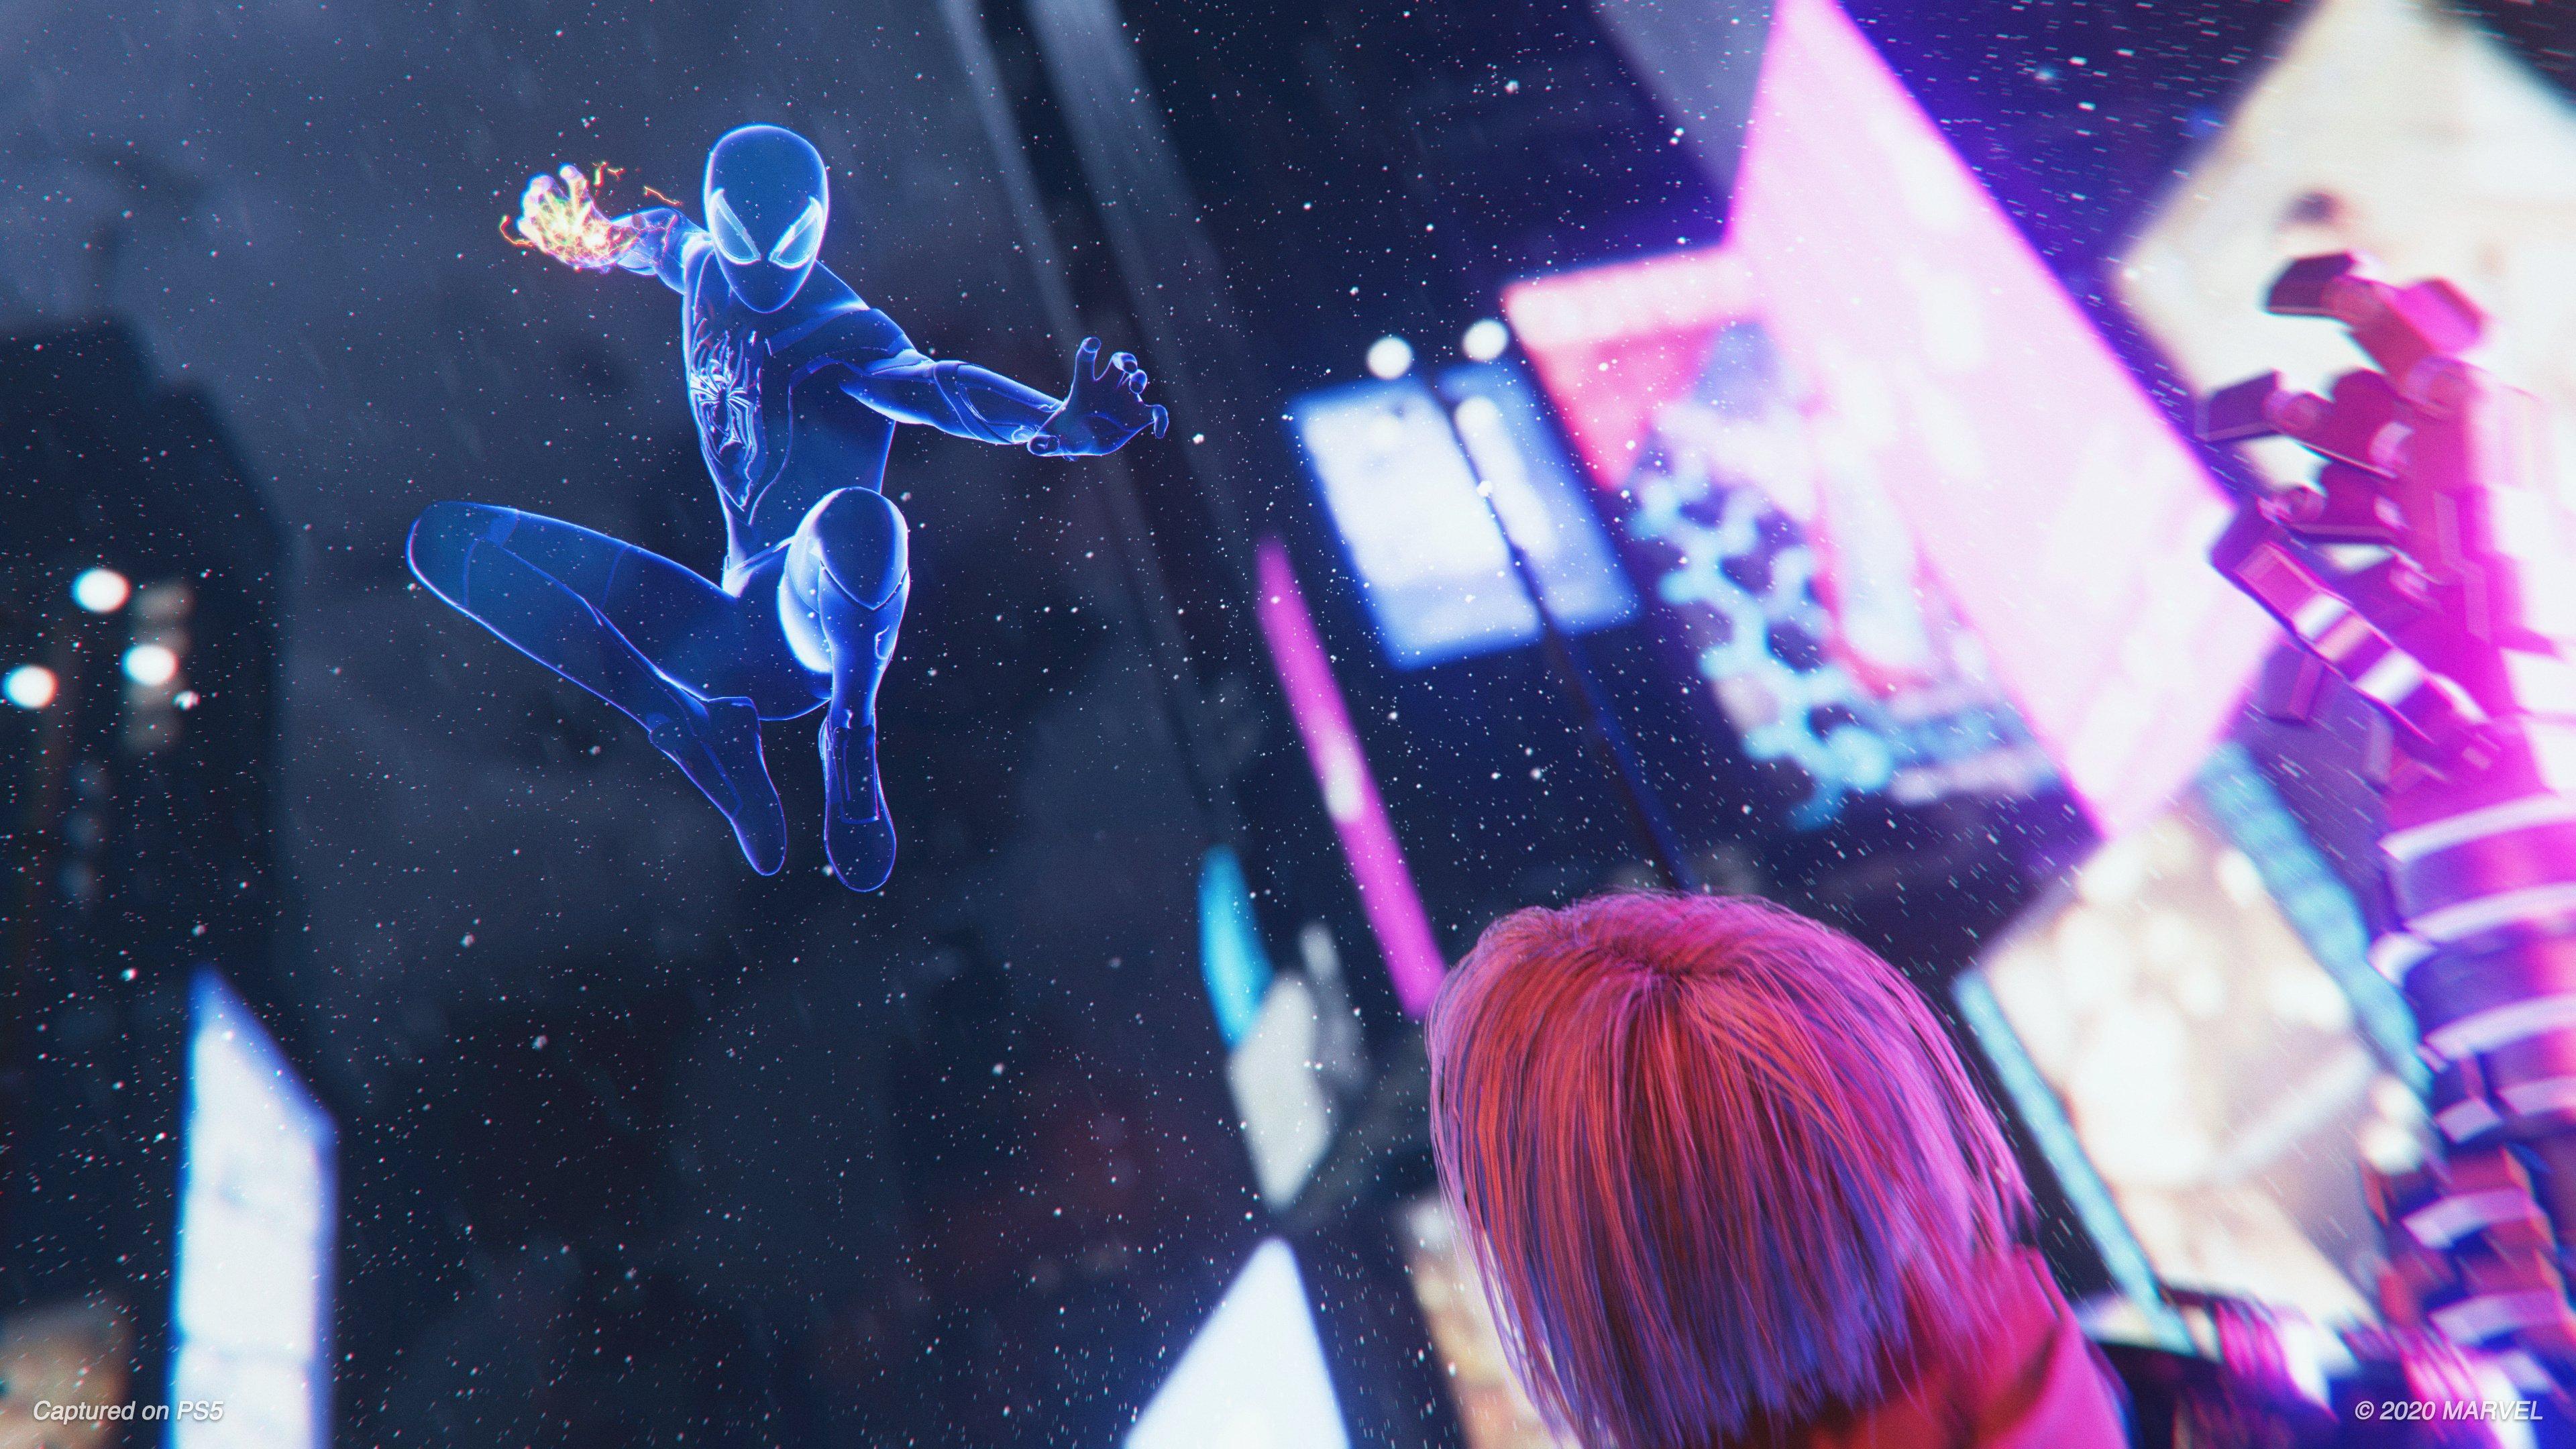 Marvel's Spider-Man: Miles Morales